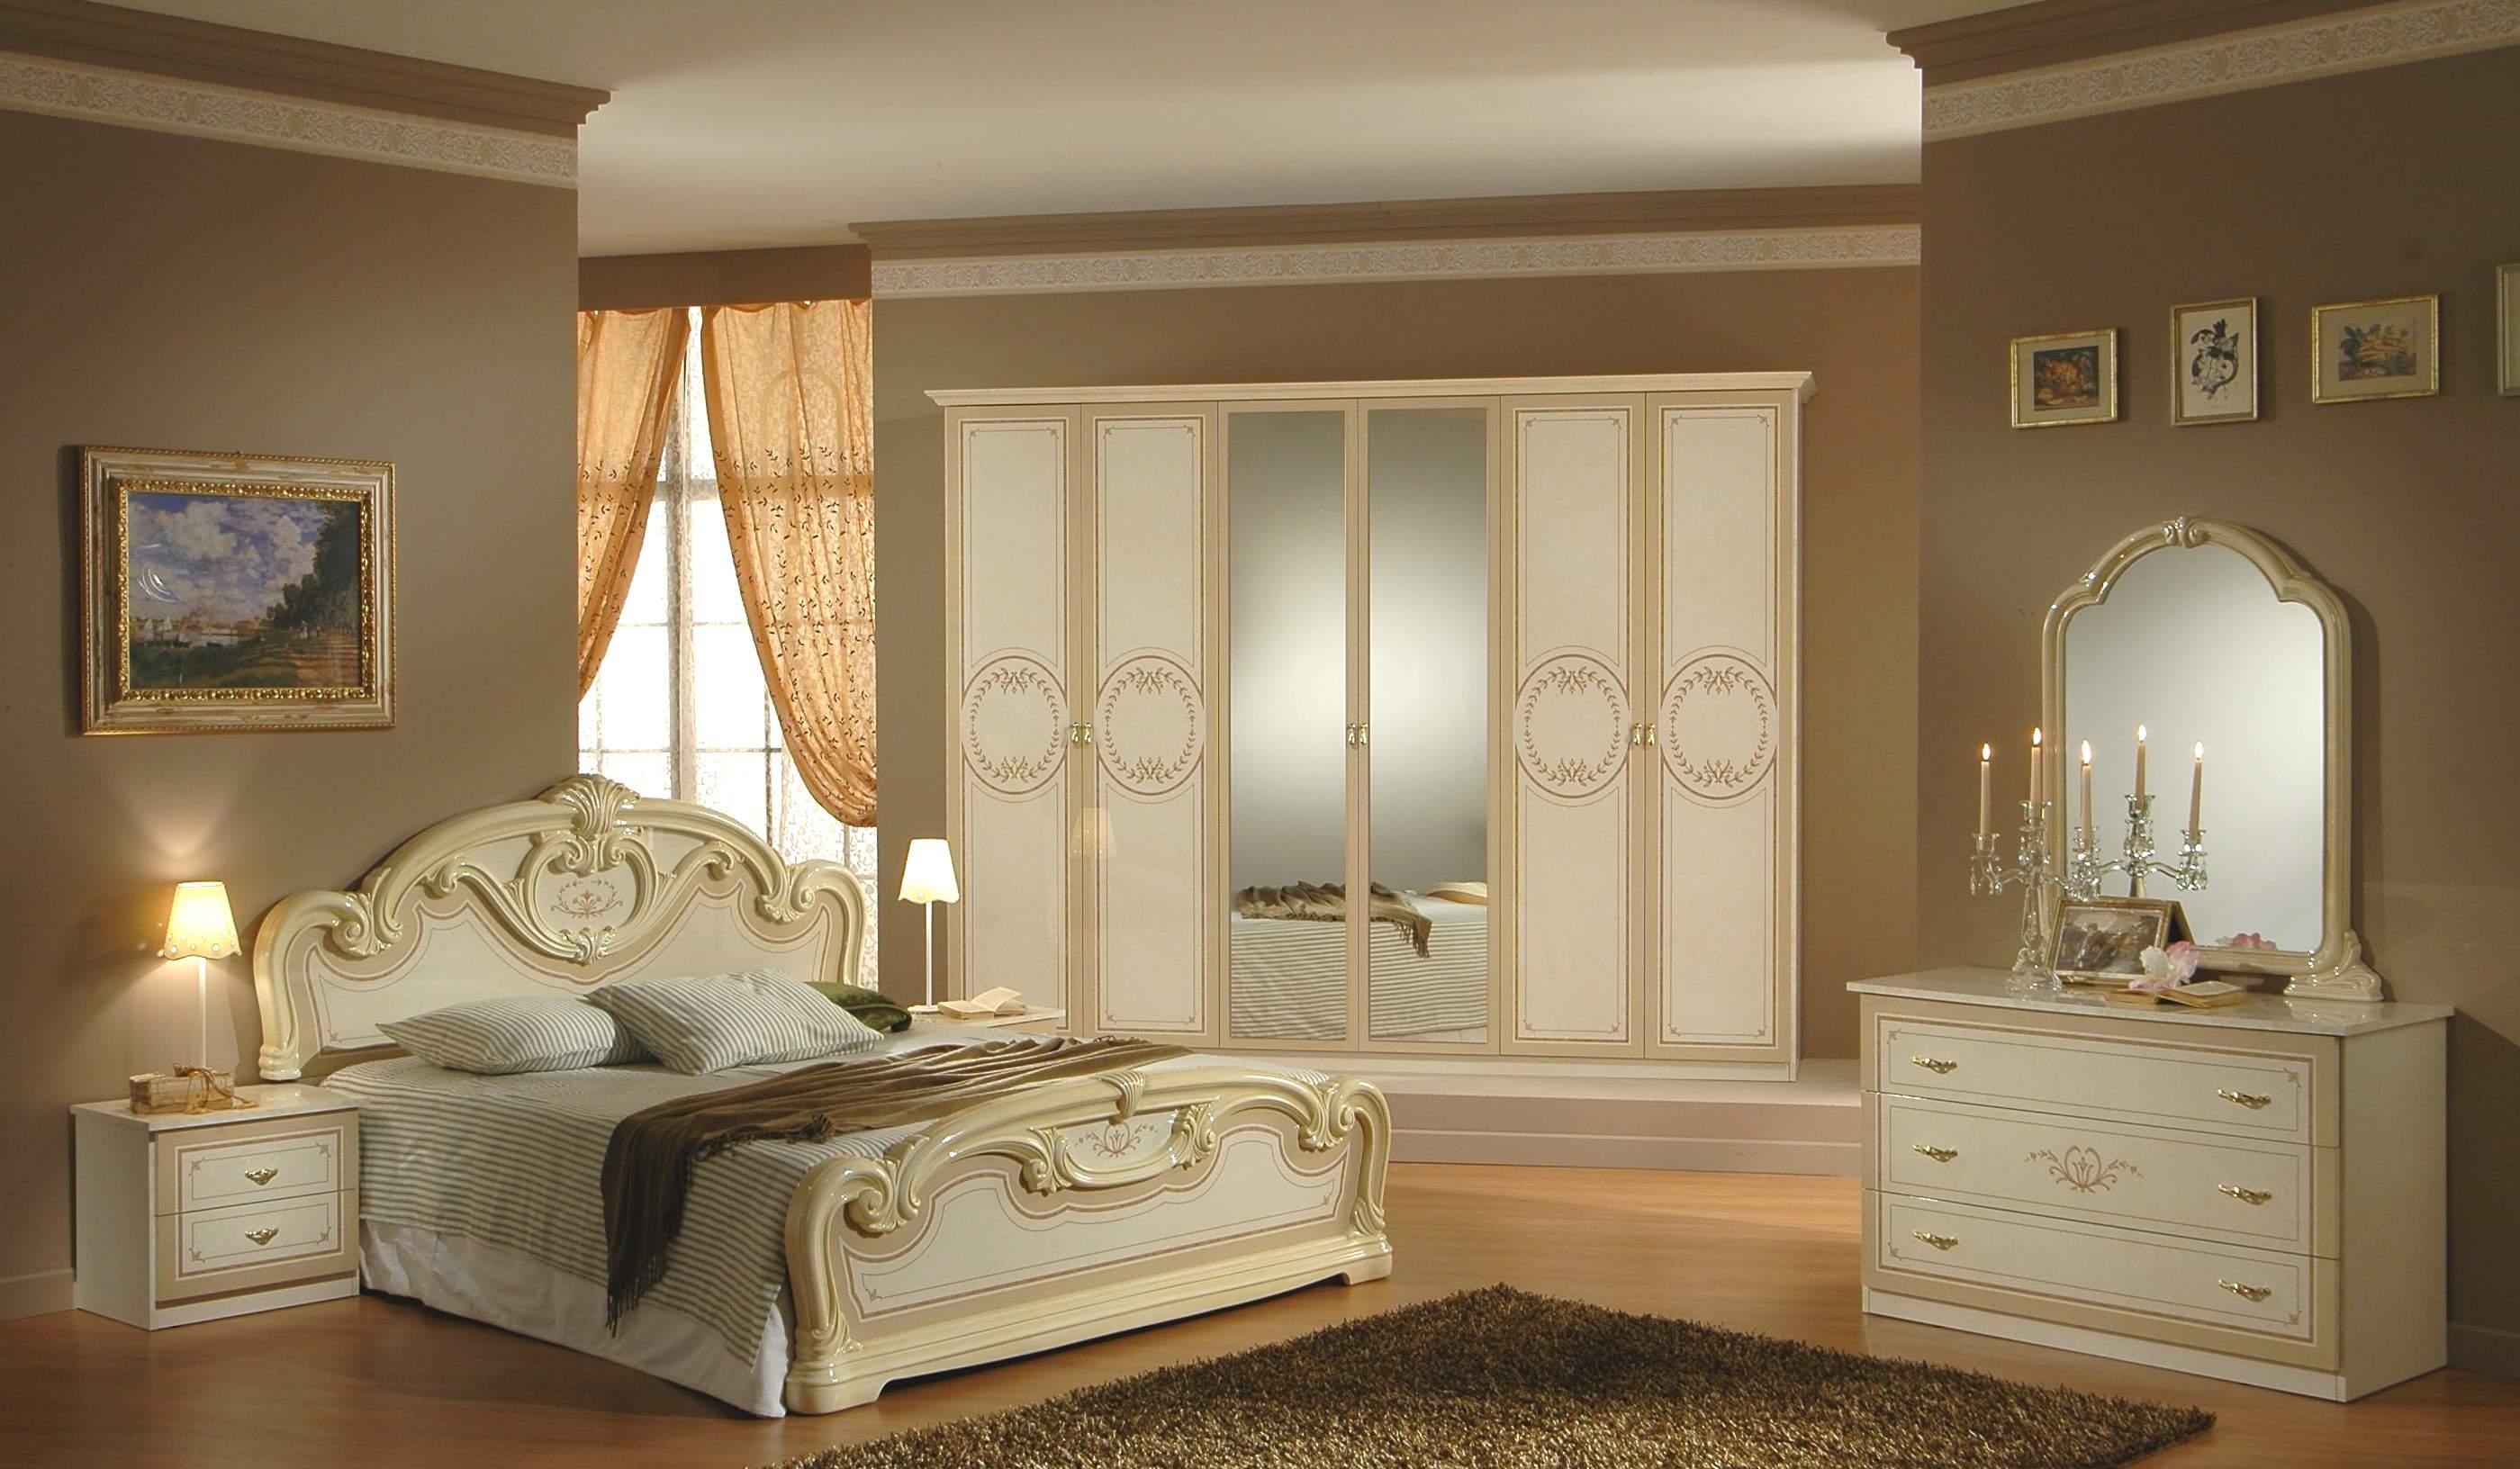 Classic Bedroom Design 8 Designs  EnhancedHomesorg